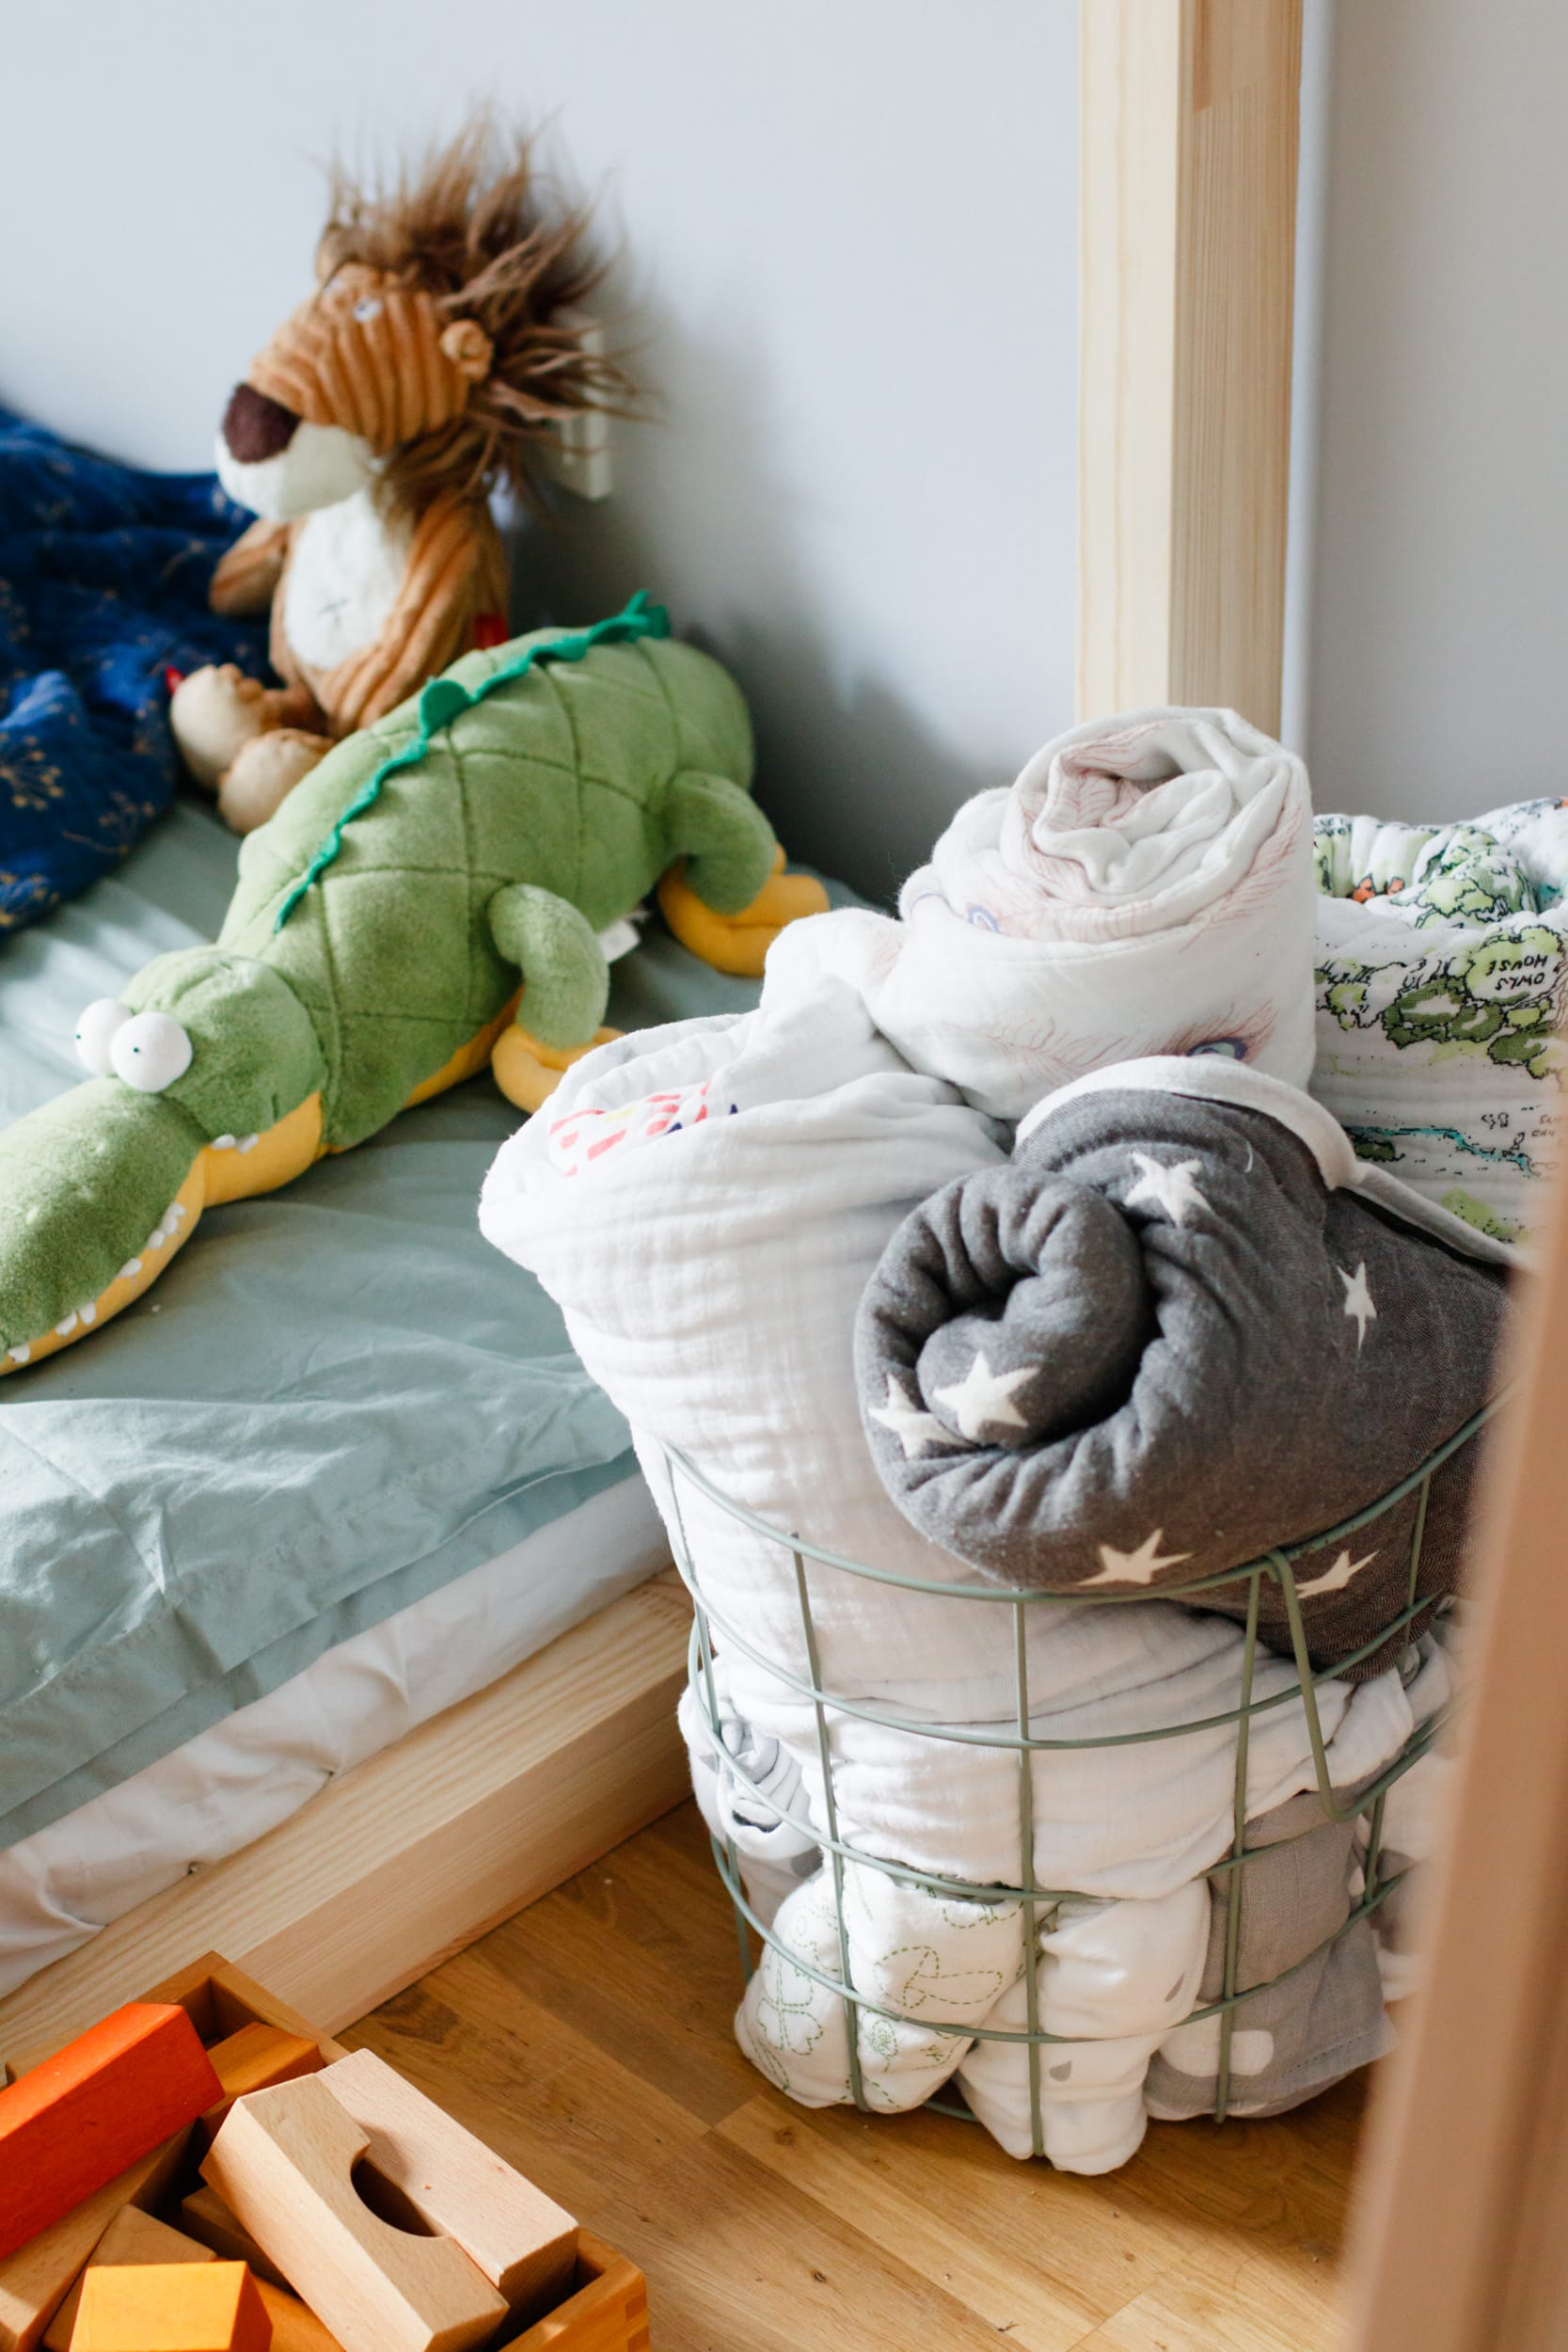 Floor Bed | Hausbett | Bodenbett | Maria Montessori | Kuschelecke | ivy.li